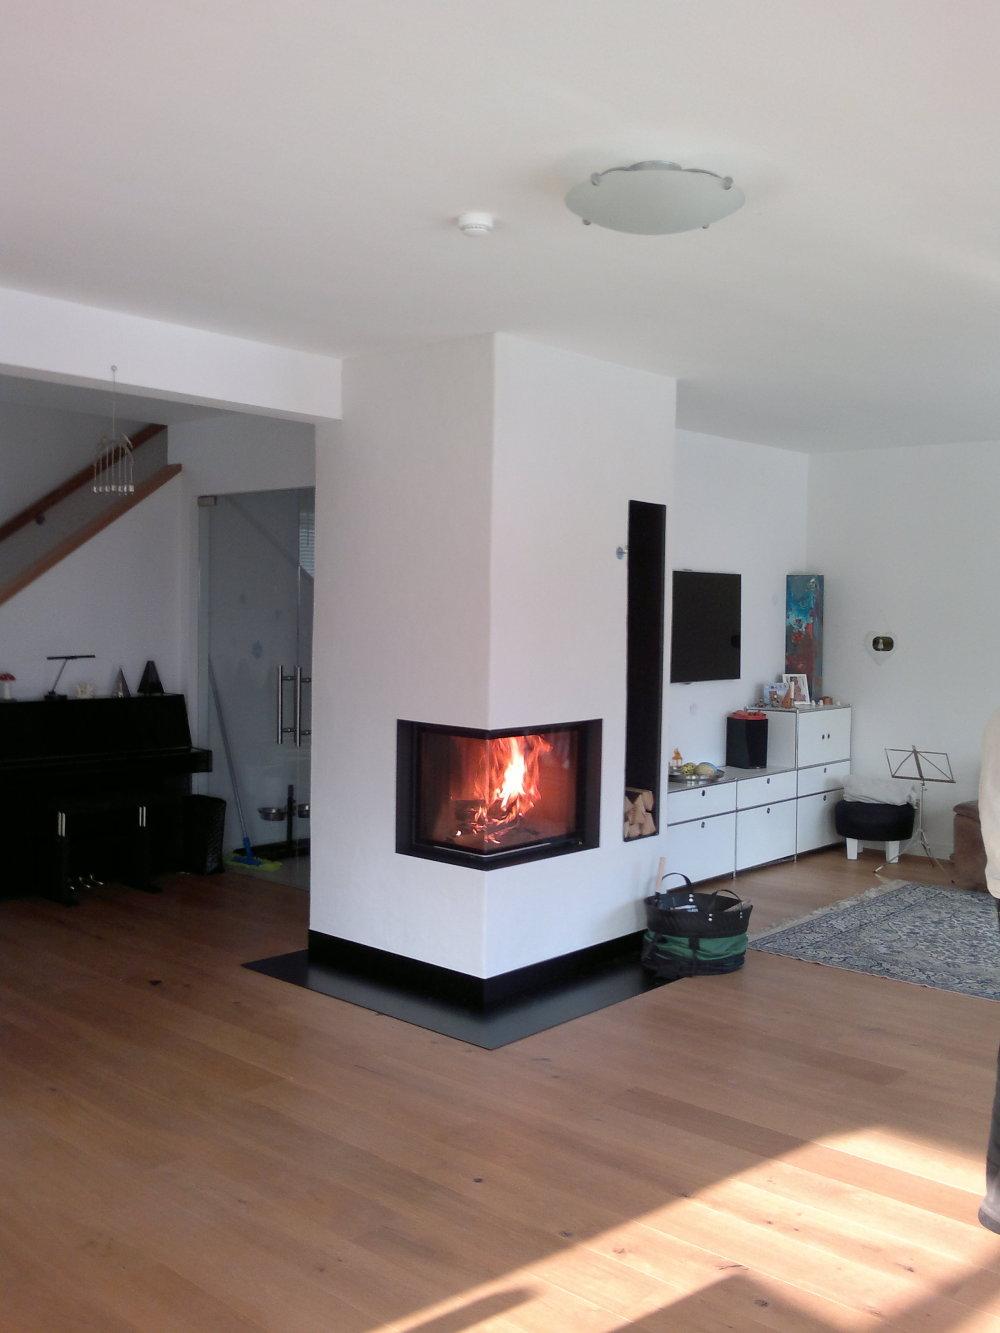 experten handwerker sanit r heizung klima in 97922 lauda. Black Bedroom Furniture Sets. Home Design Ideas